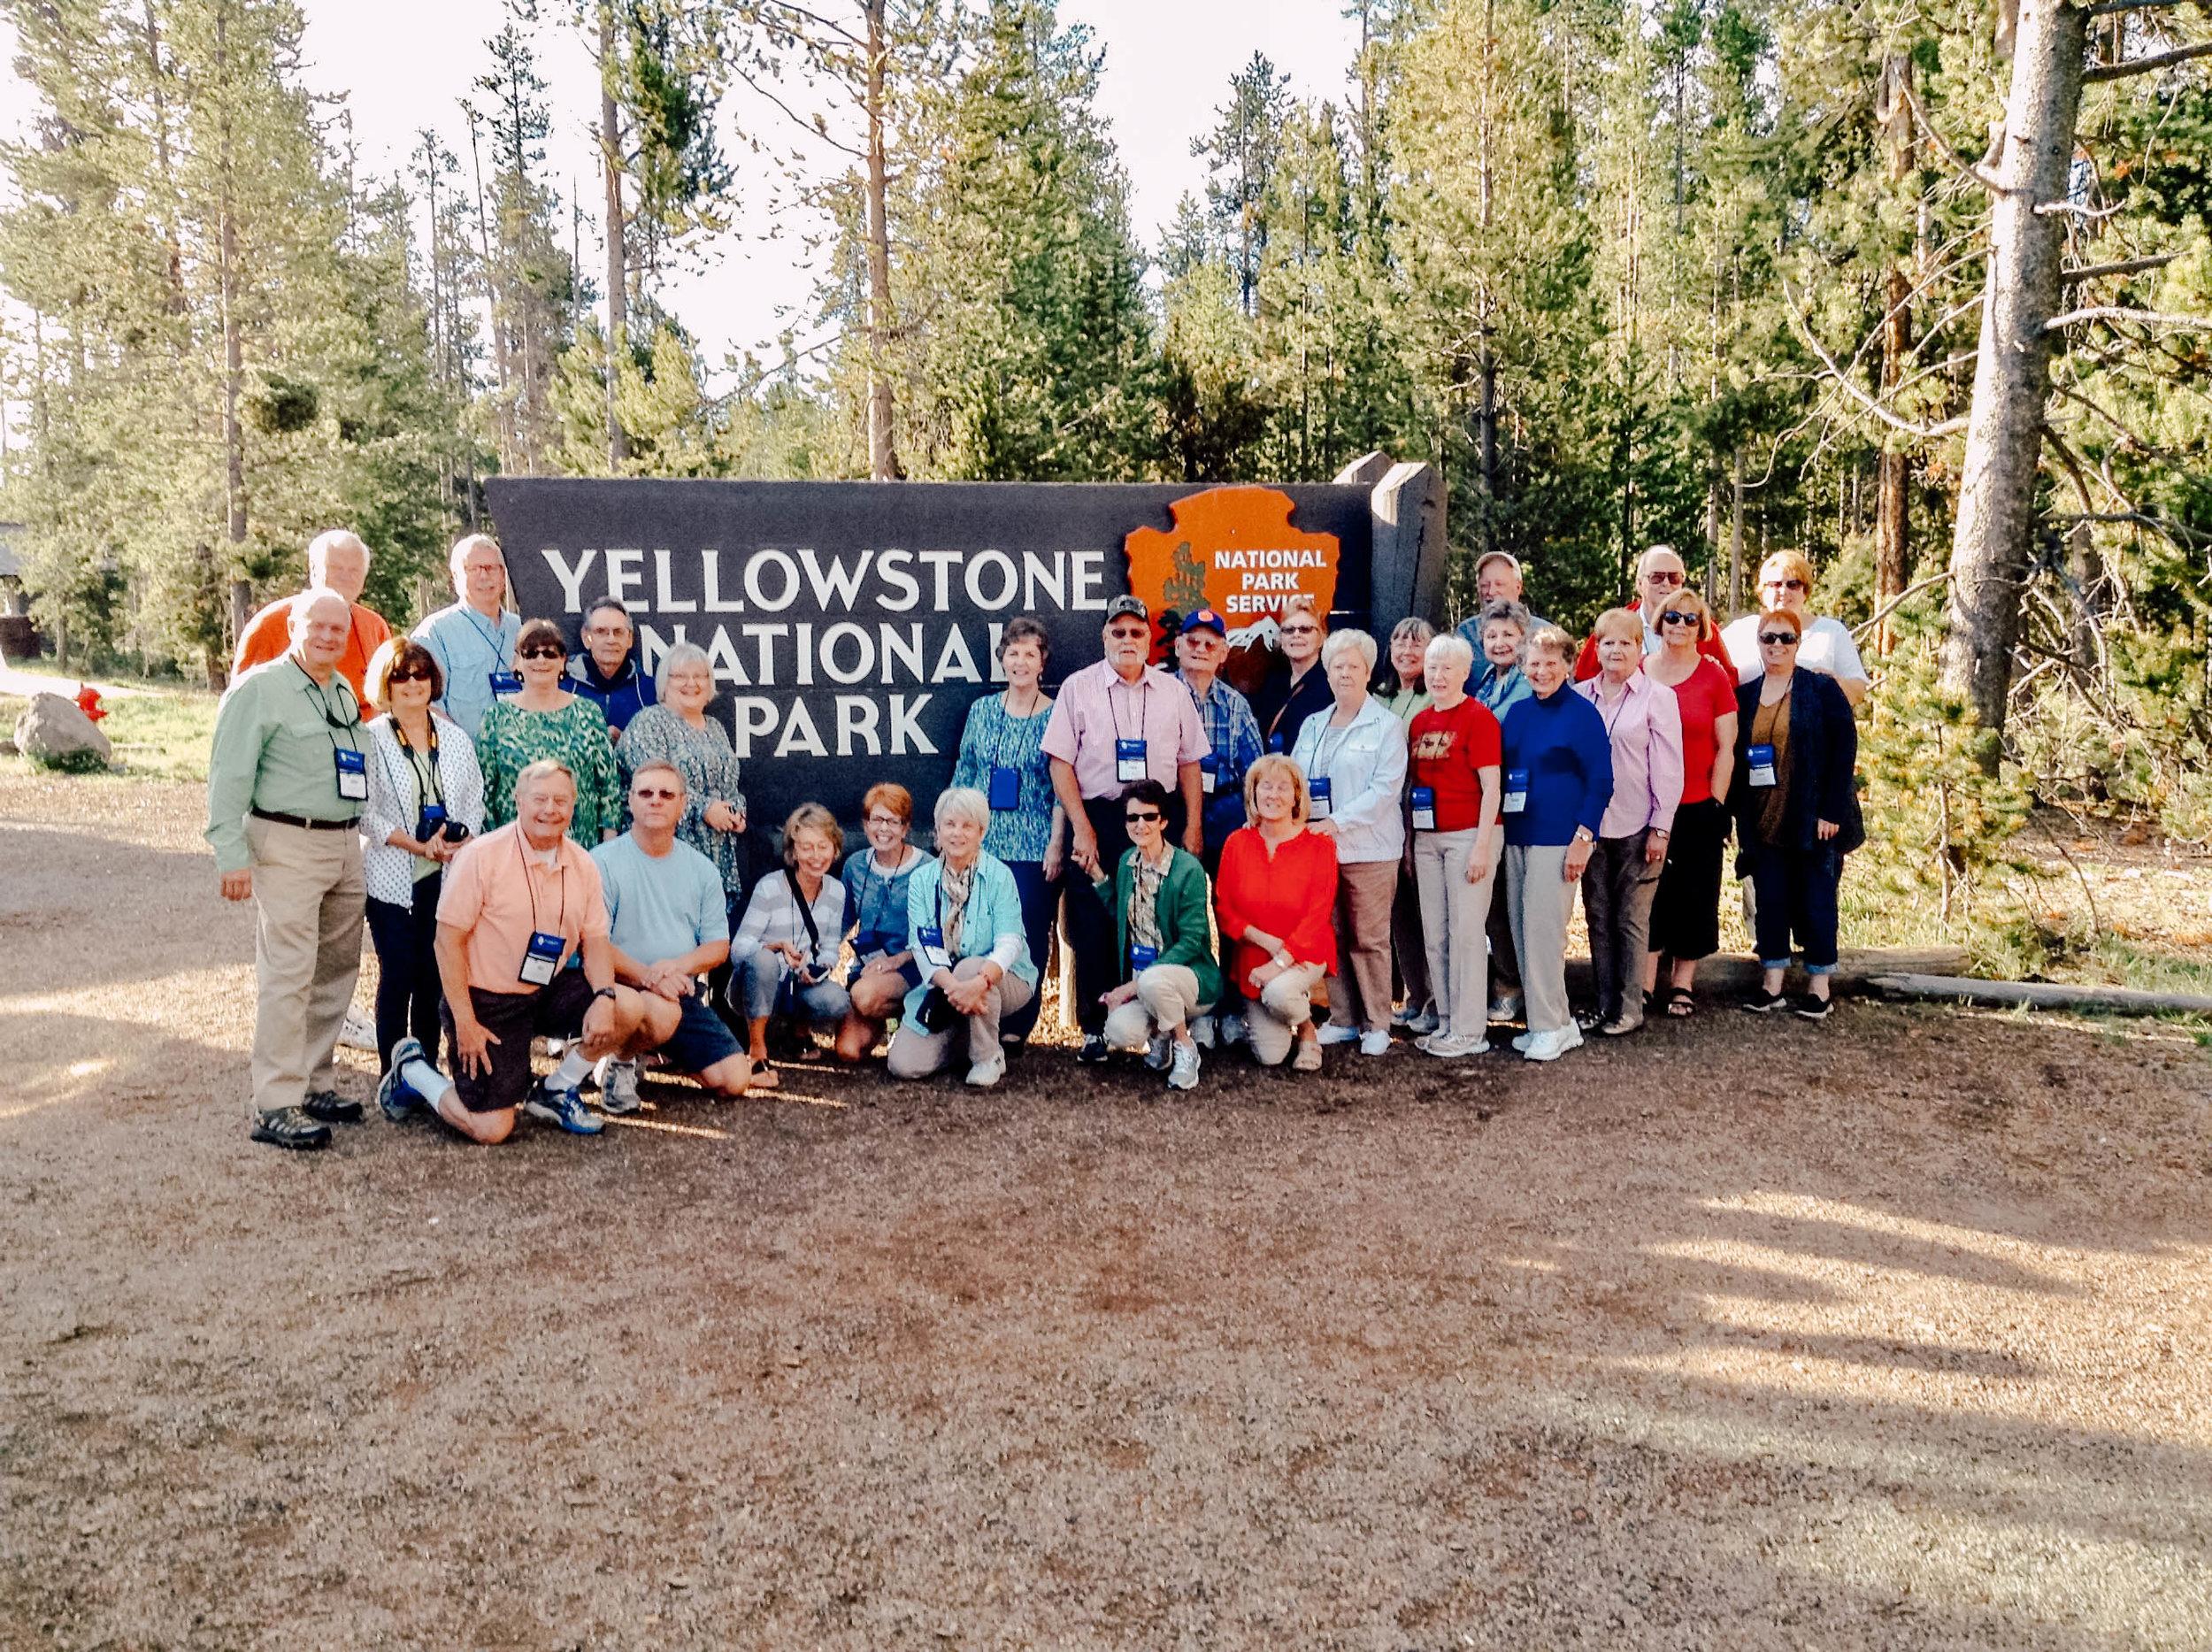 Wyoming_Yellowstone_AdultTour_2017_CarolPoole_Group_02.jpg